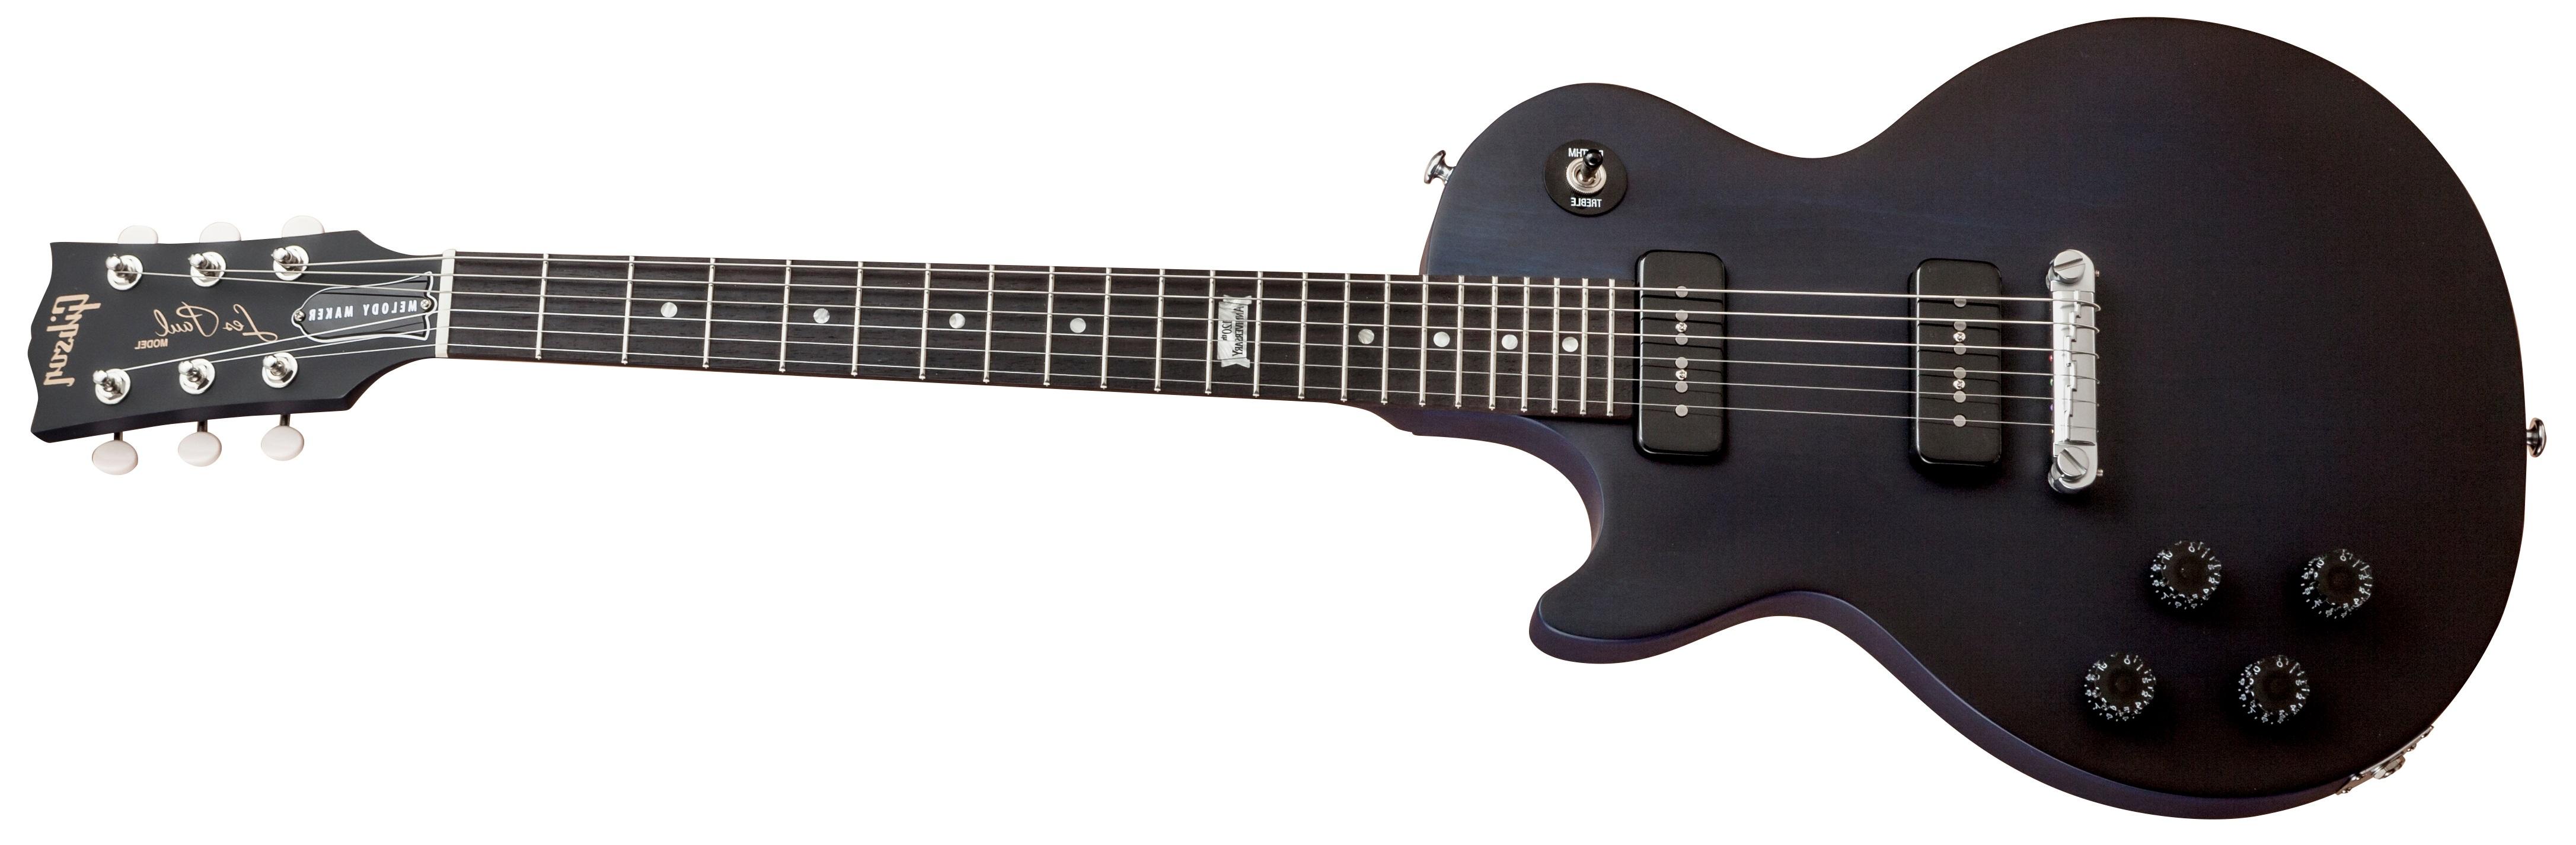 Gibson Les Paul Melody Maker 2014 - Satin Manhattan Midnight